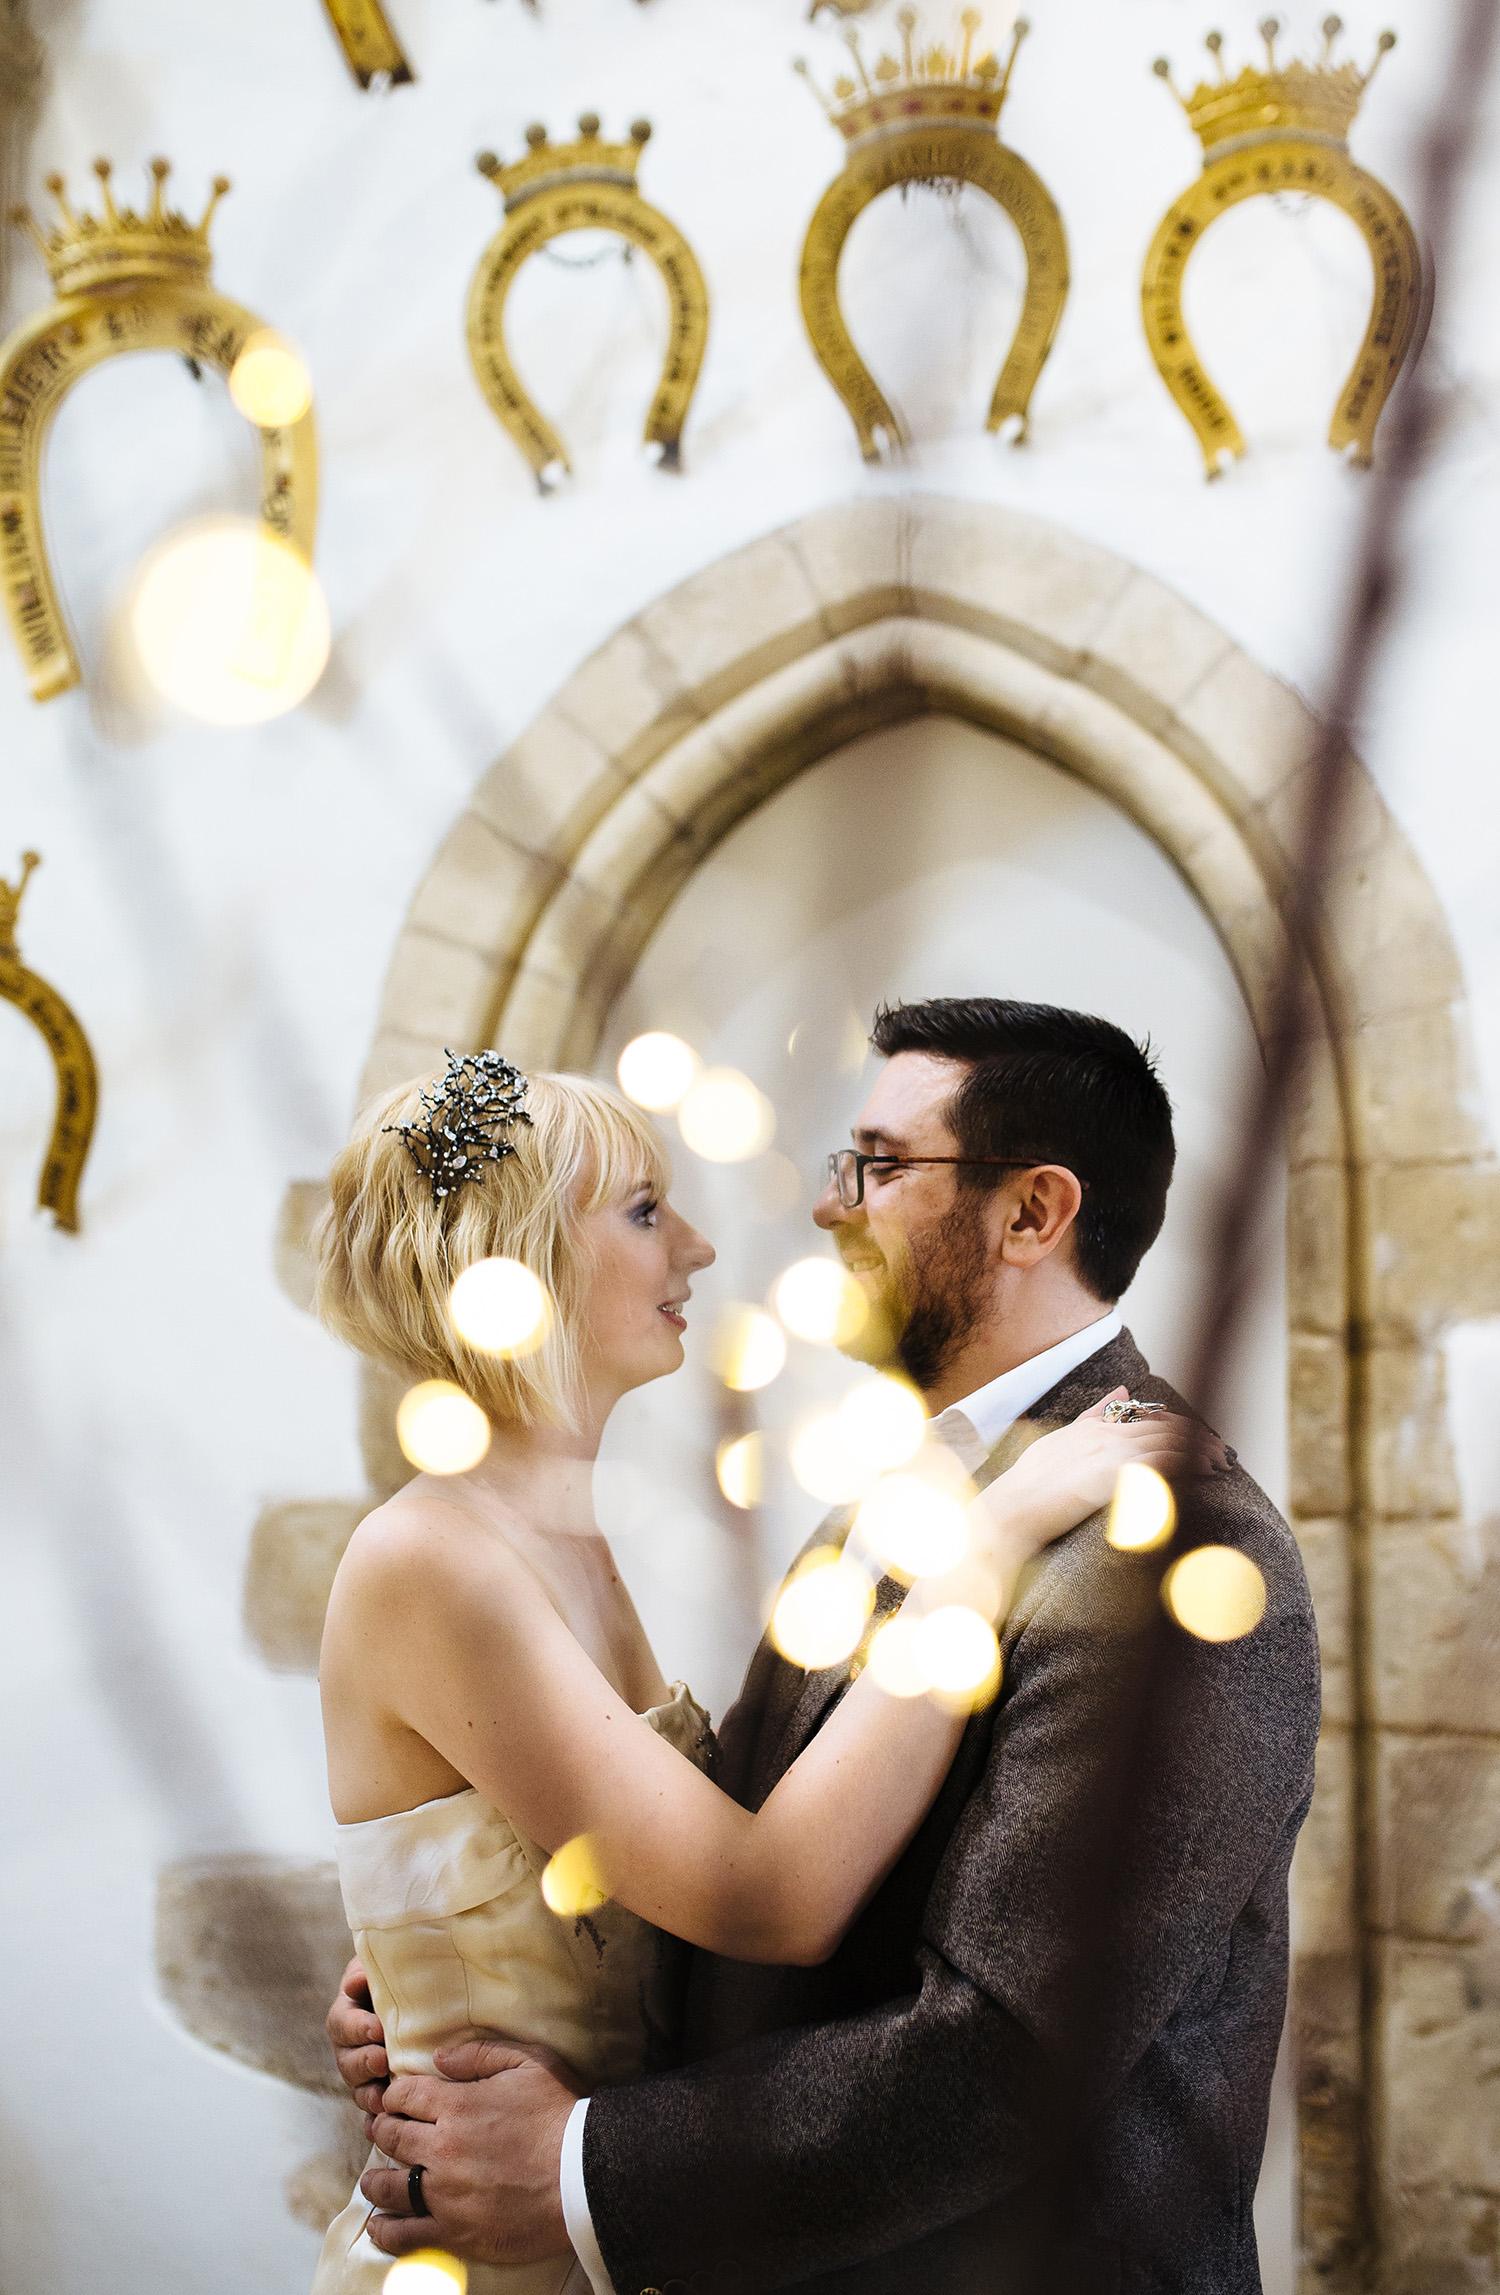 FRIDAY THE 13TH HALLOWEEN WEDDING RUTLAND014.jpg